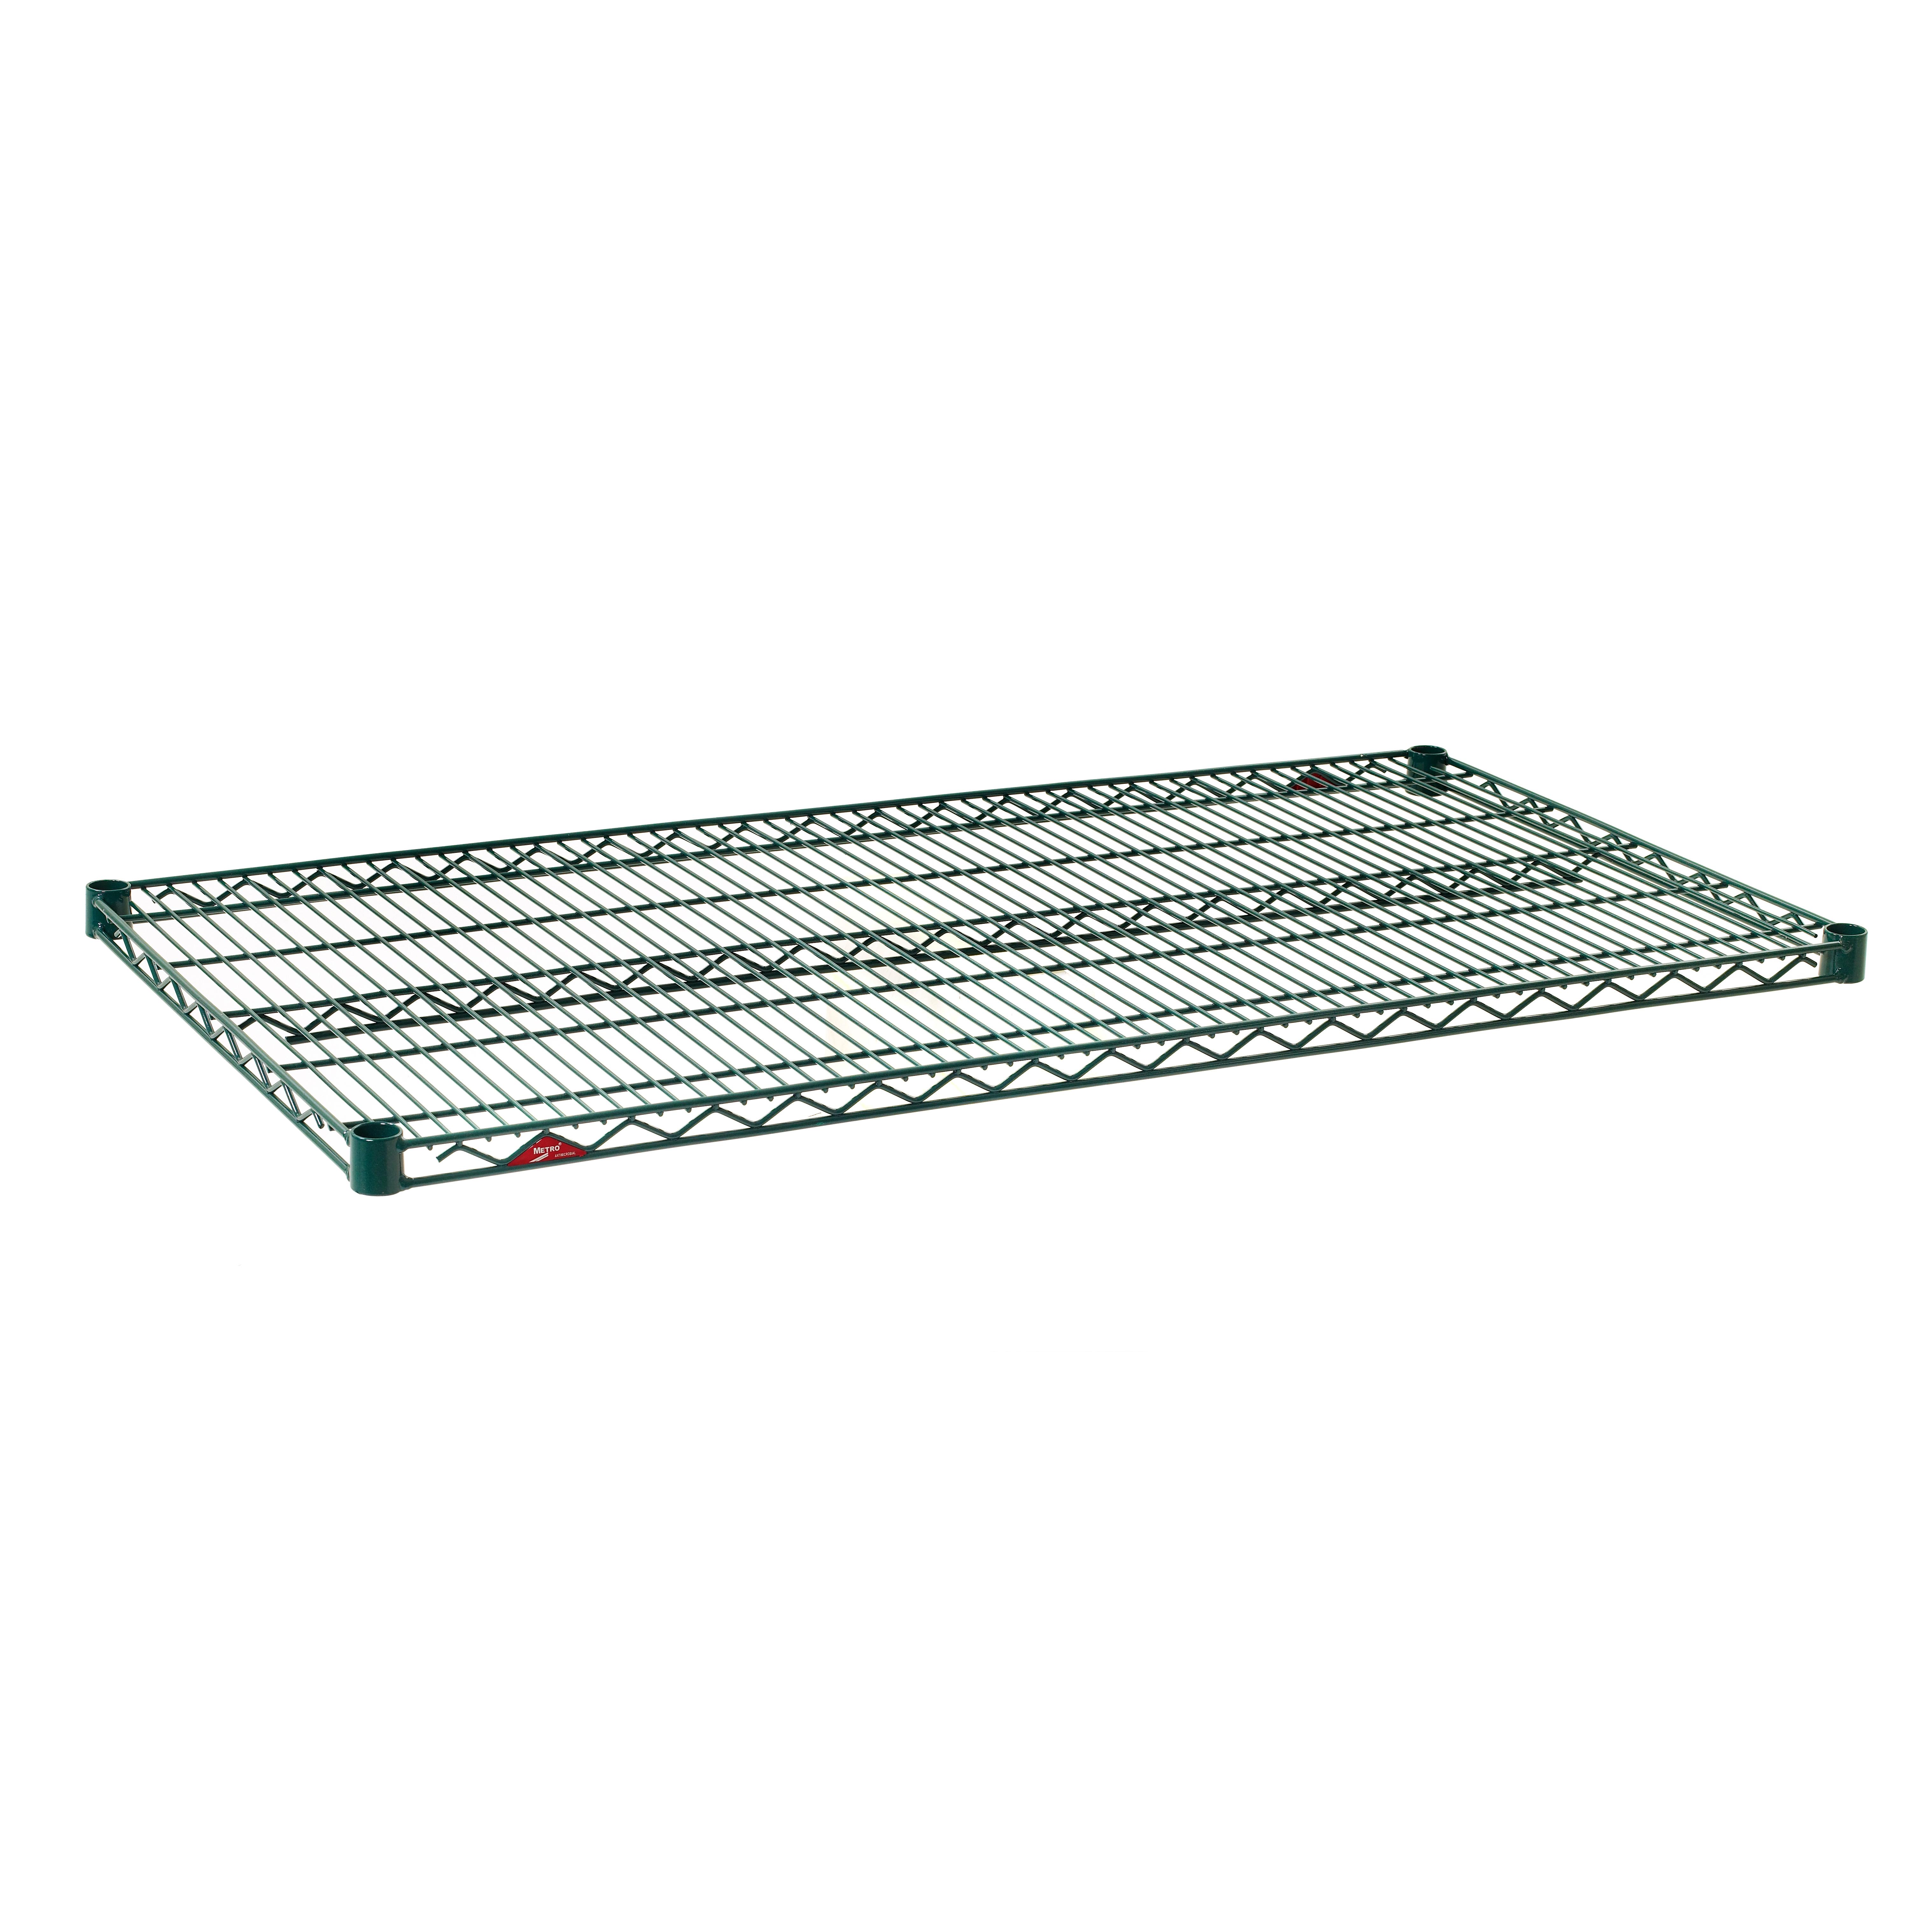 Metro 1424NK3 shelving, racks & carts/wire shelving/wire shelves